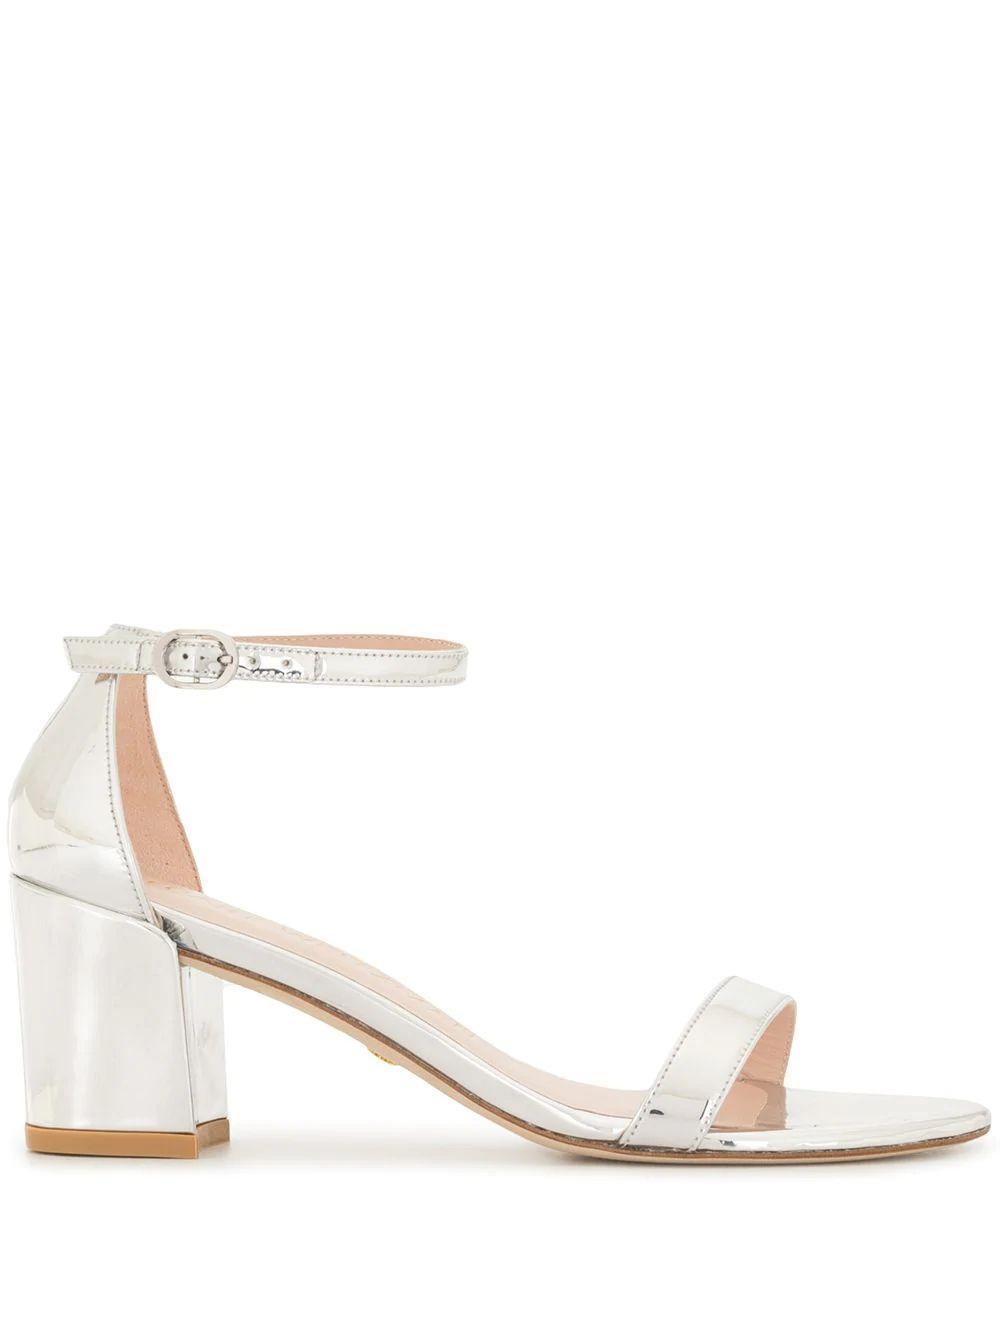 Simple Metallic Block Heel Sandal Item # SIMPLE-SPE